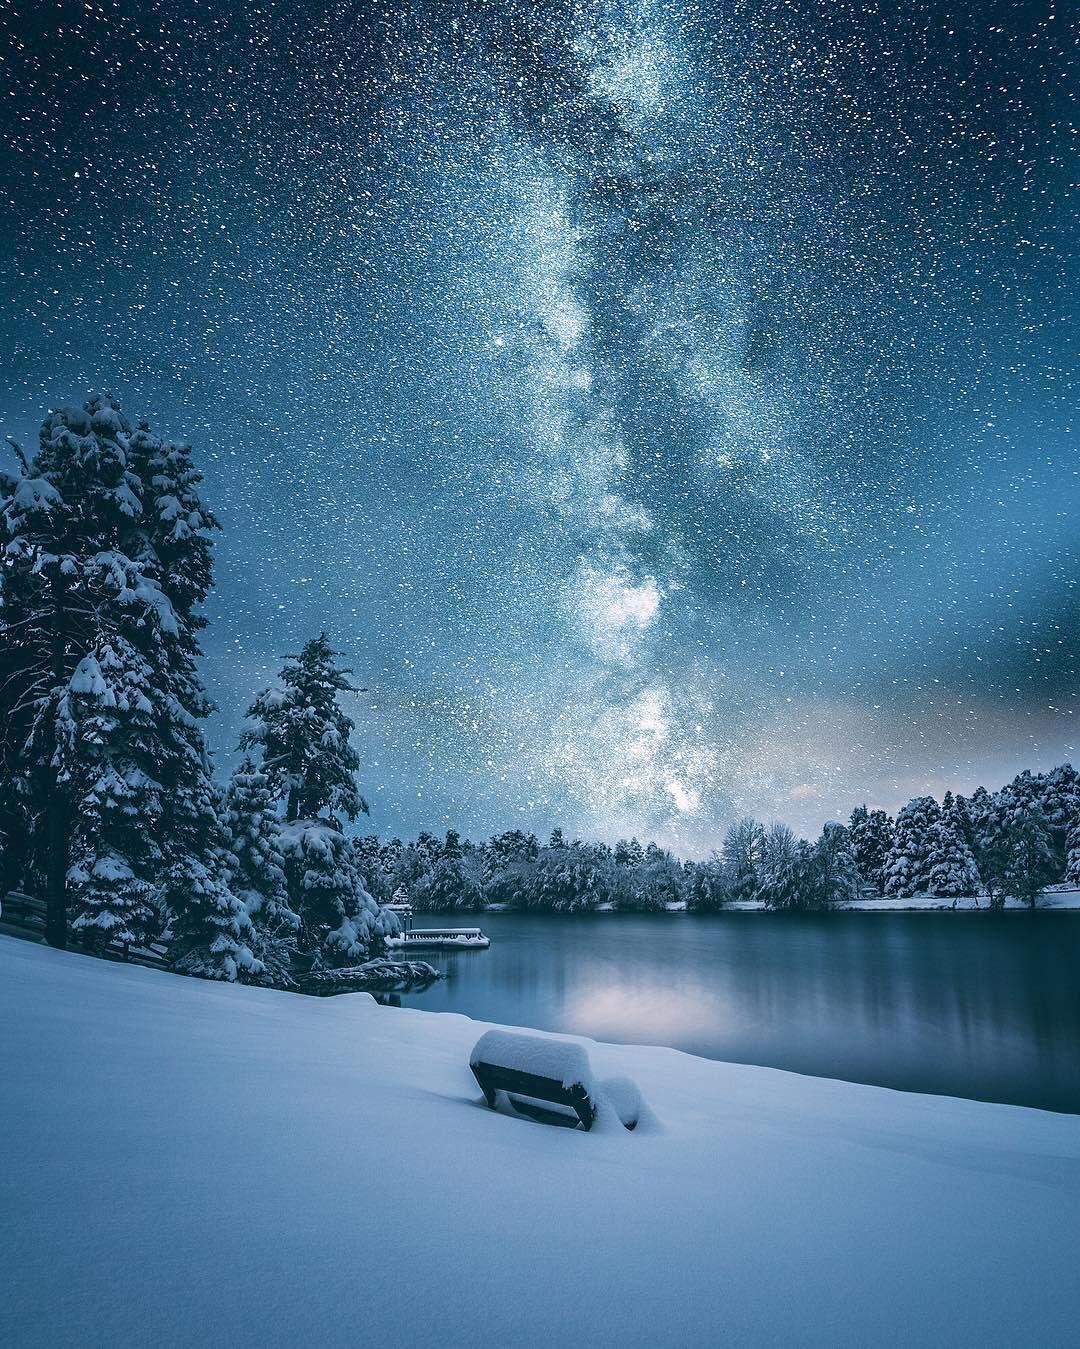 Starry Night Bolu Turkey Photography By C Cuma Cevik Night Landscape Winter Landscape Winter Scenery